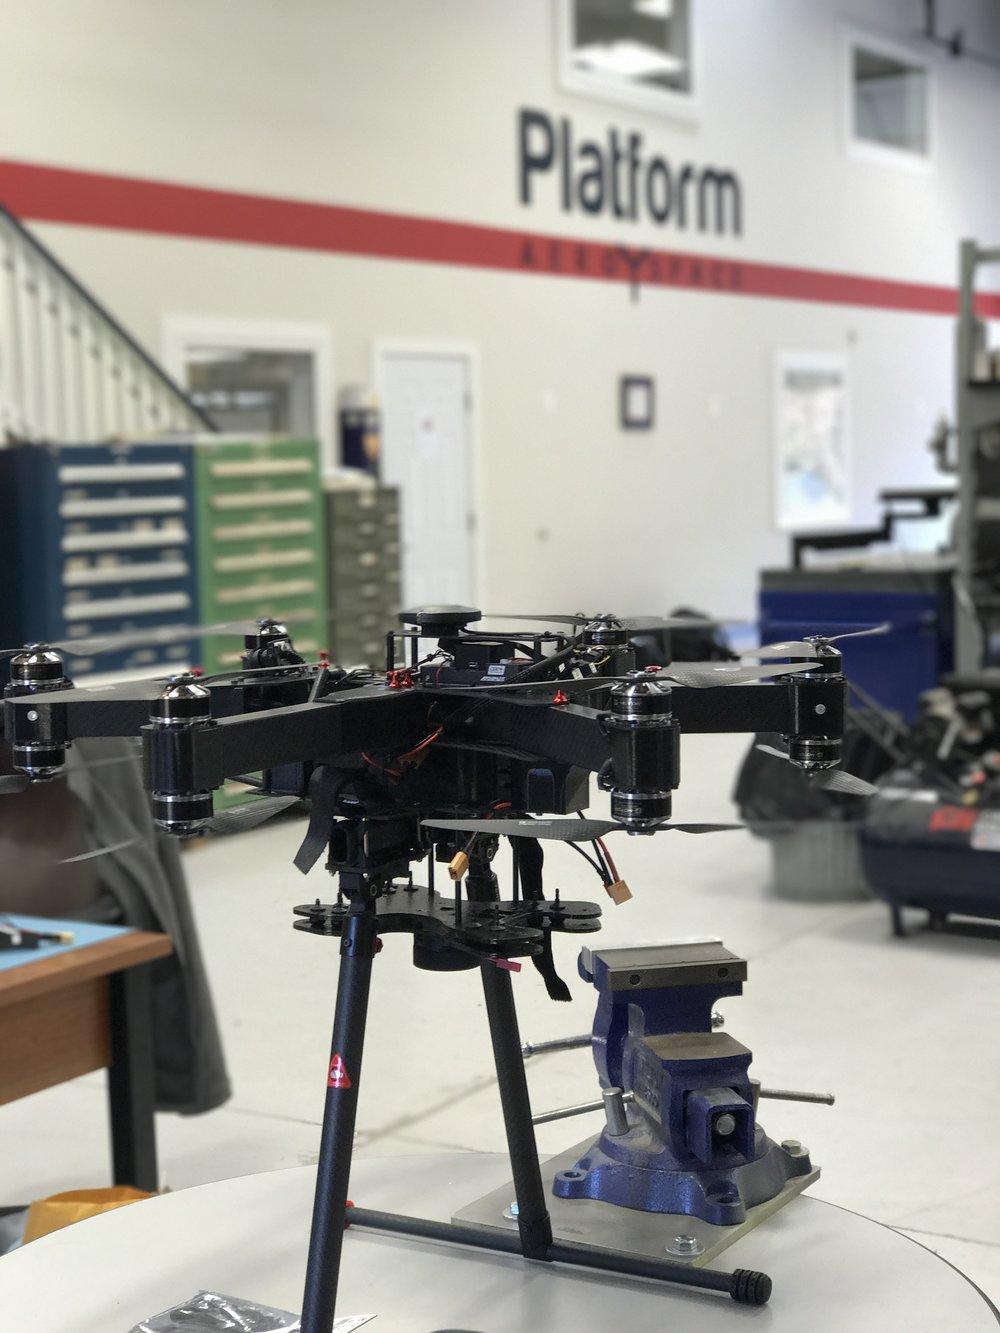 PlatformAerospace_Drone 01.jpg